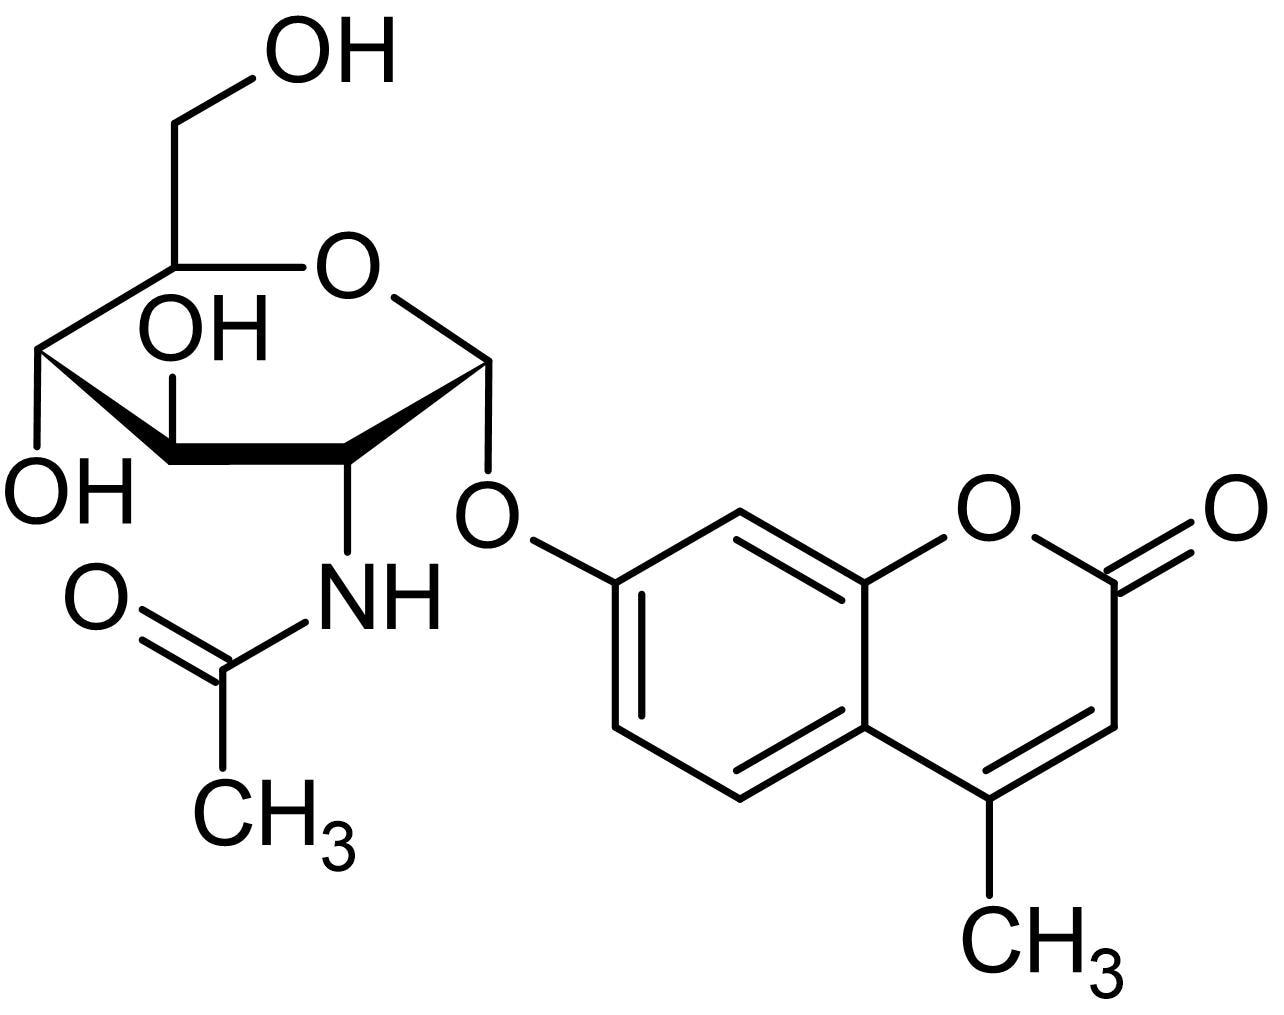 Chemical Structure - 4-Methylumbelliferyl 2-acetamido-2-deoxy-alpha-D-glucopyranoside, Fluorogenic substrate (ab144785)